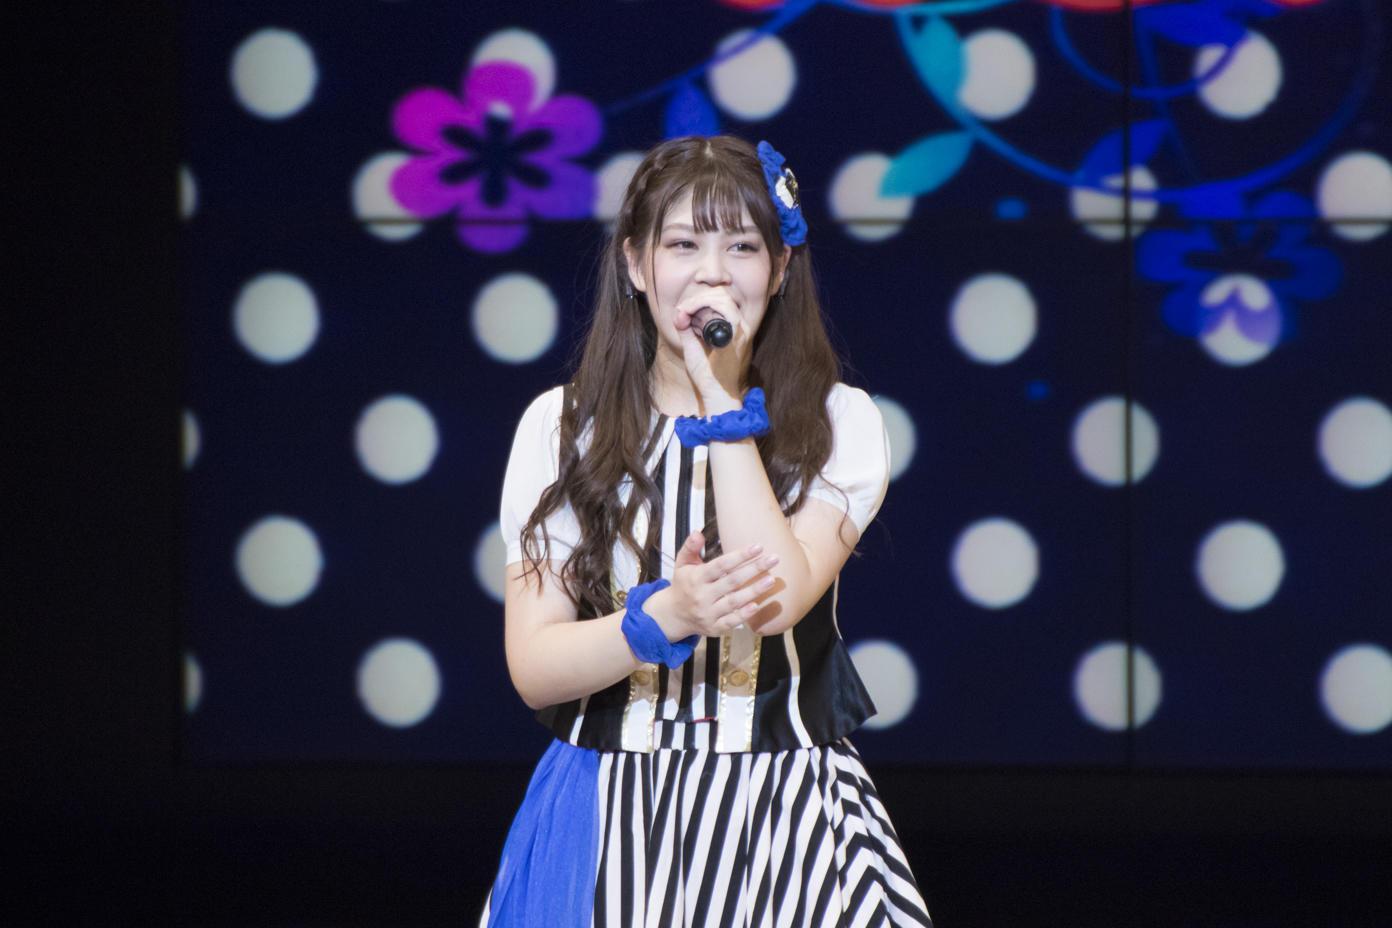 http://news.yoshimoto.co.jp/20161228143849-eb7163484fb99fb1963abcabcaf36aabf76ef0ec.jpg